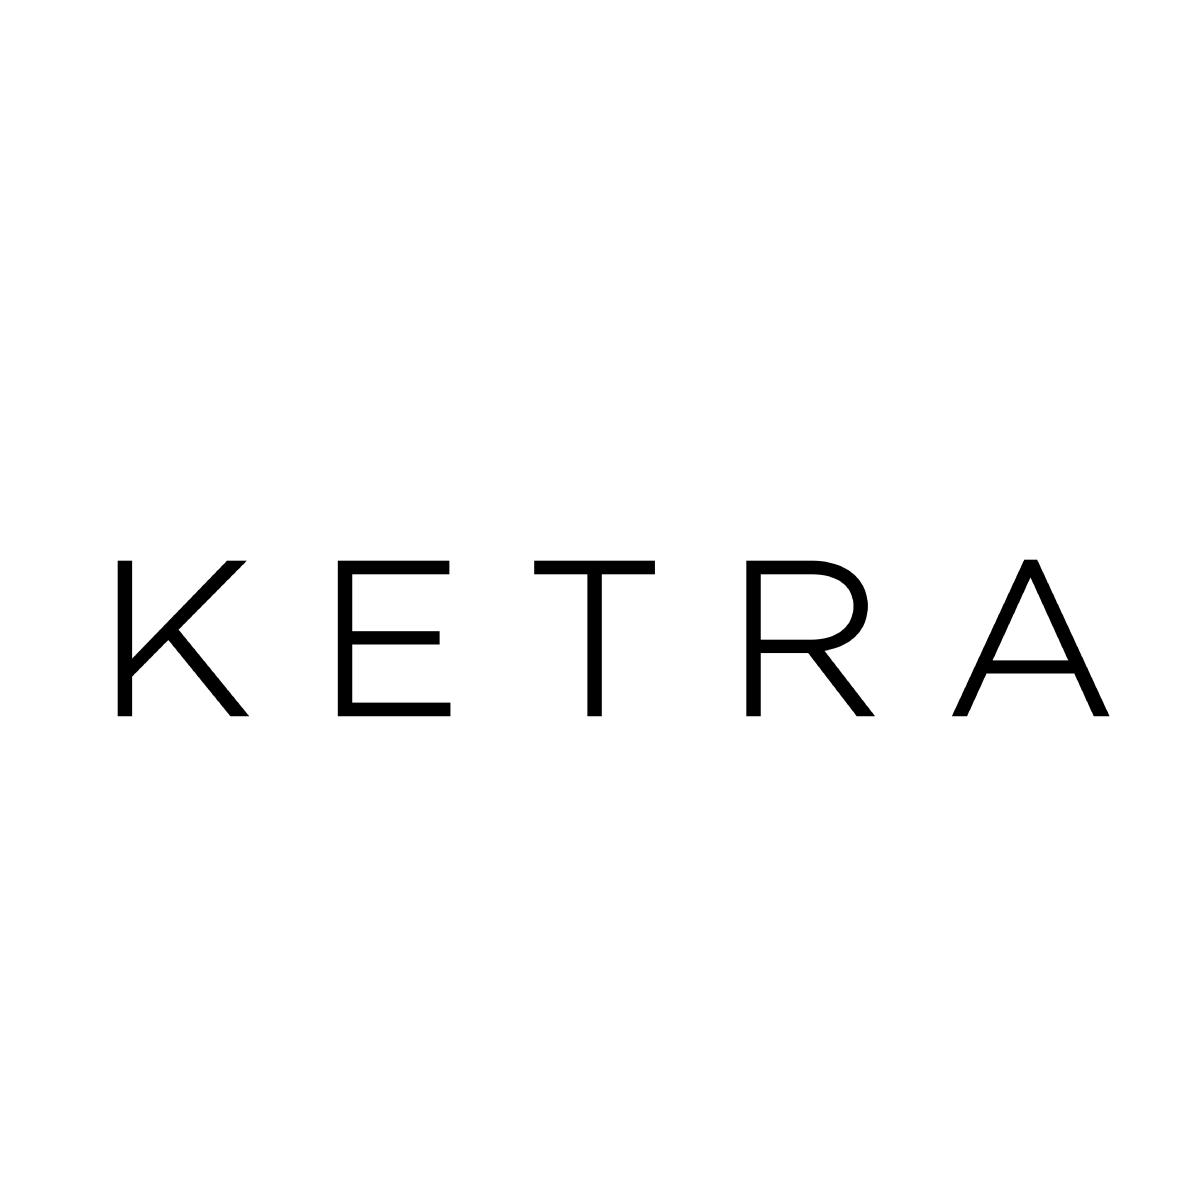 KETRA-01.png